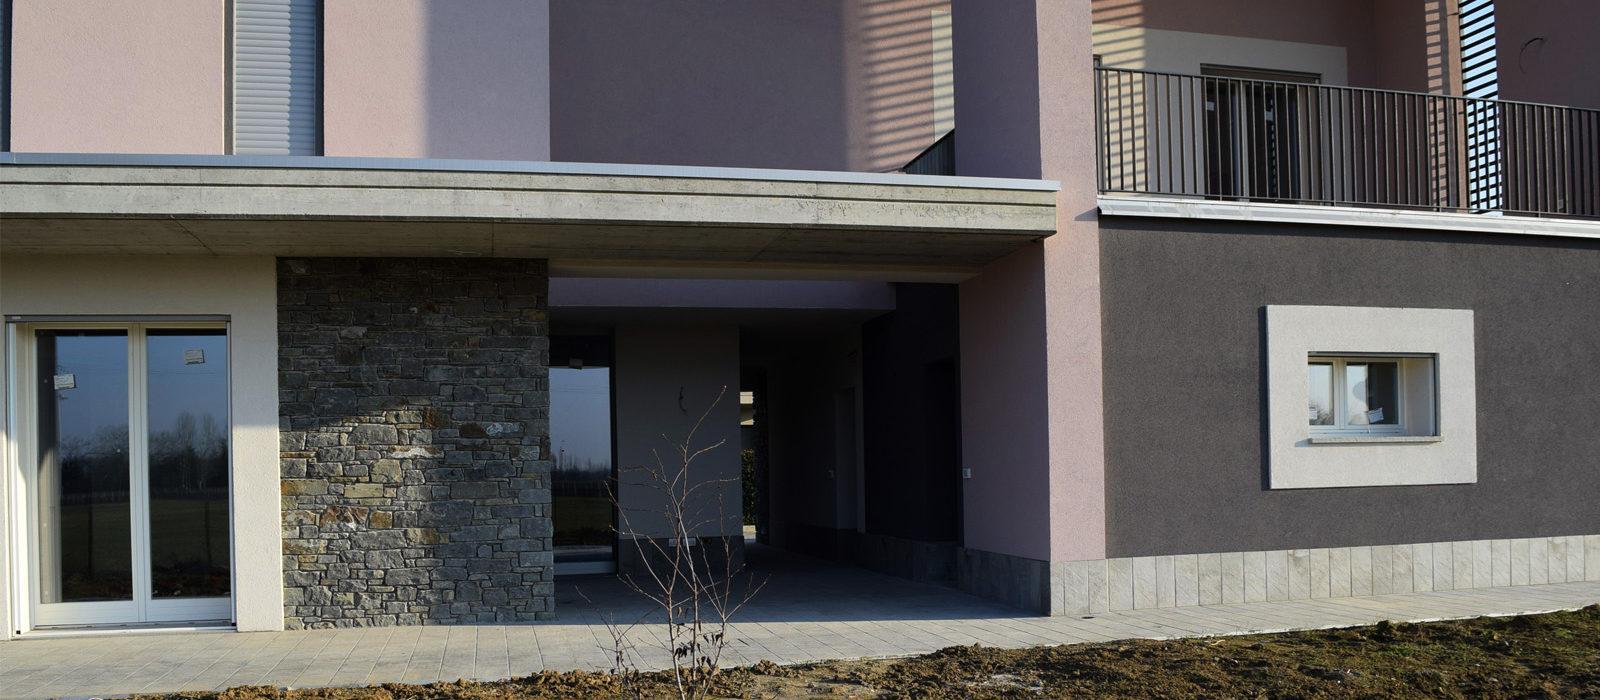 arch.giuseppe passaroA slide